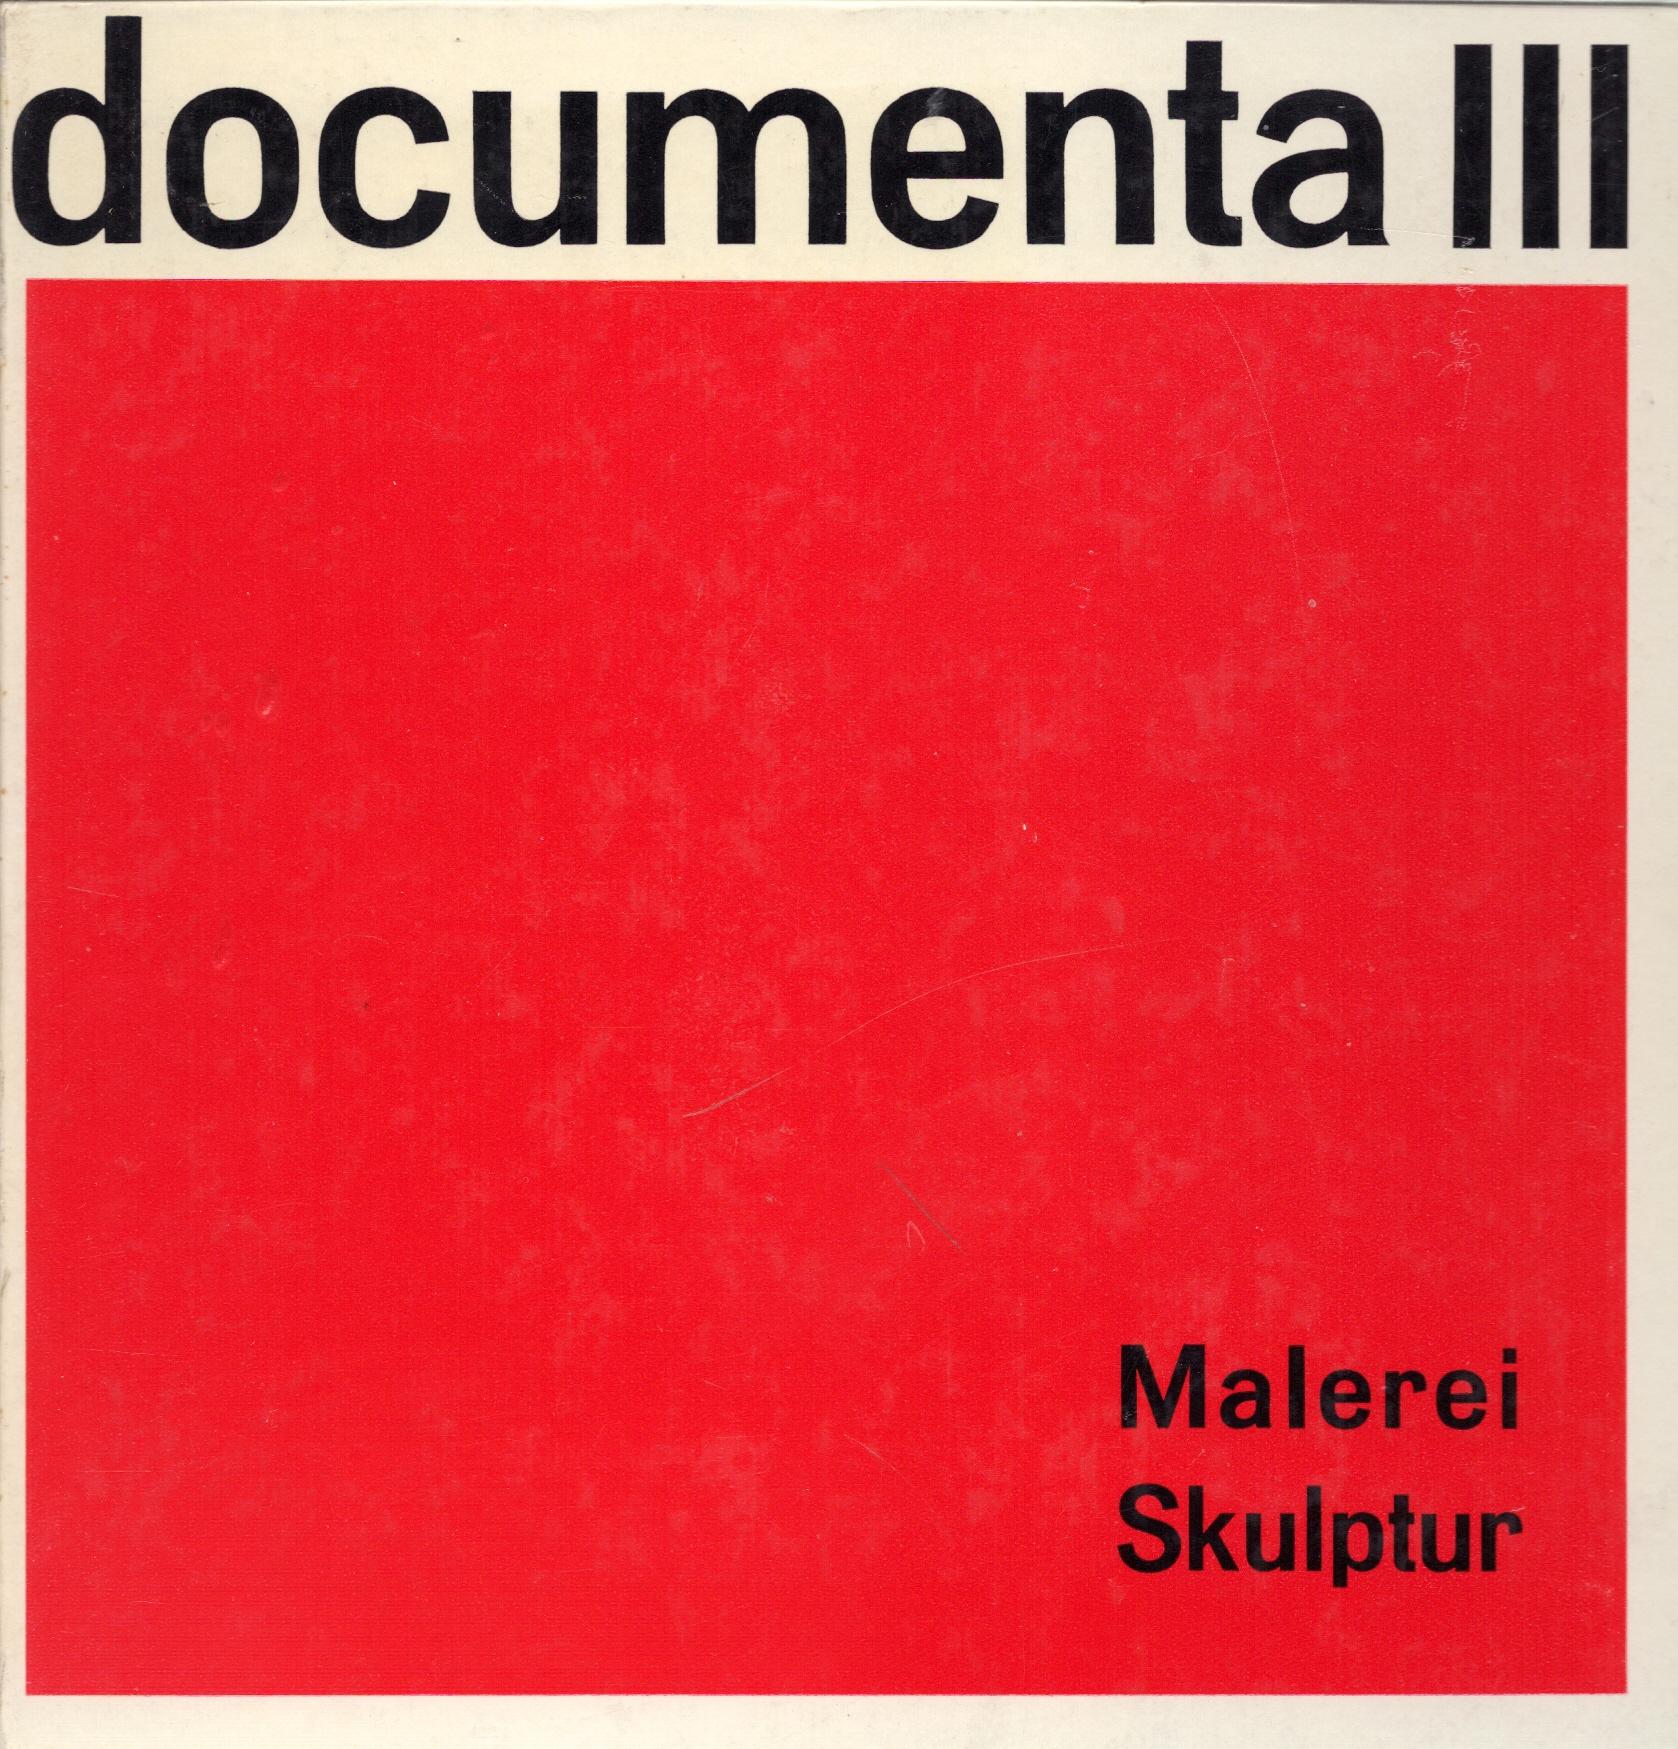 Documenta III, Dumont, 1964